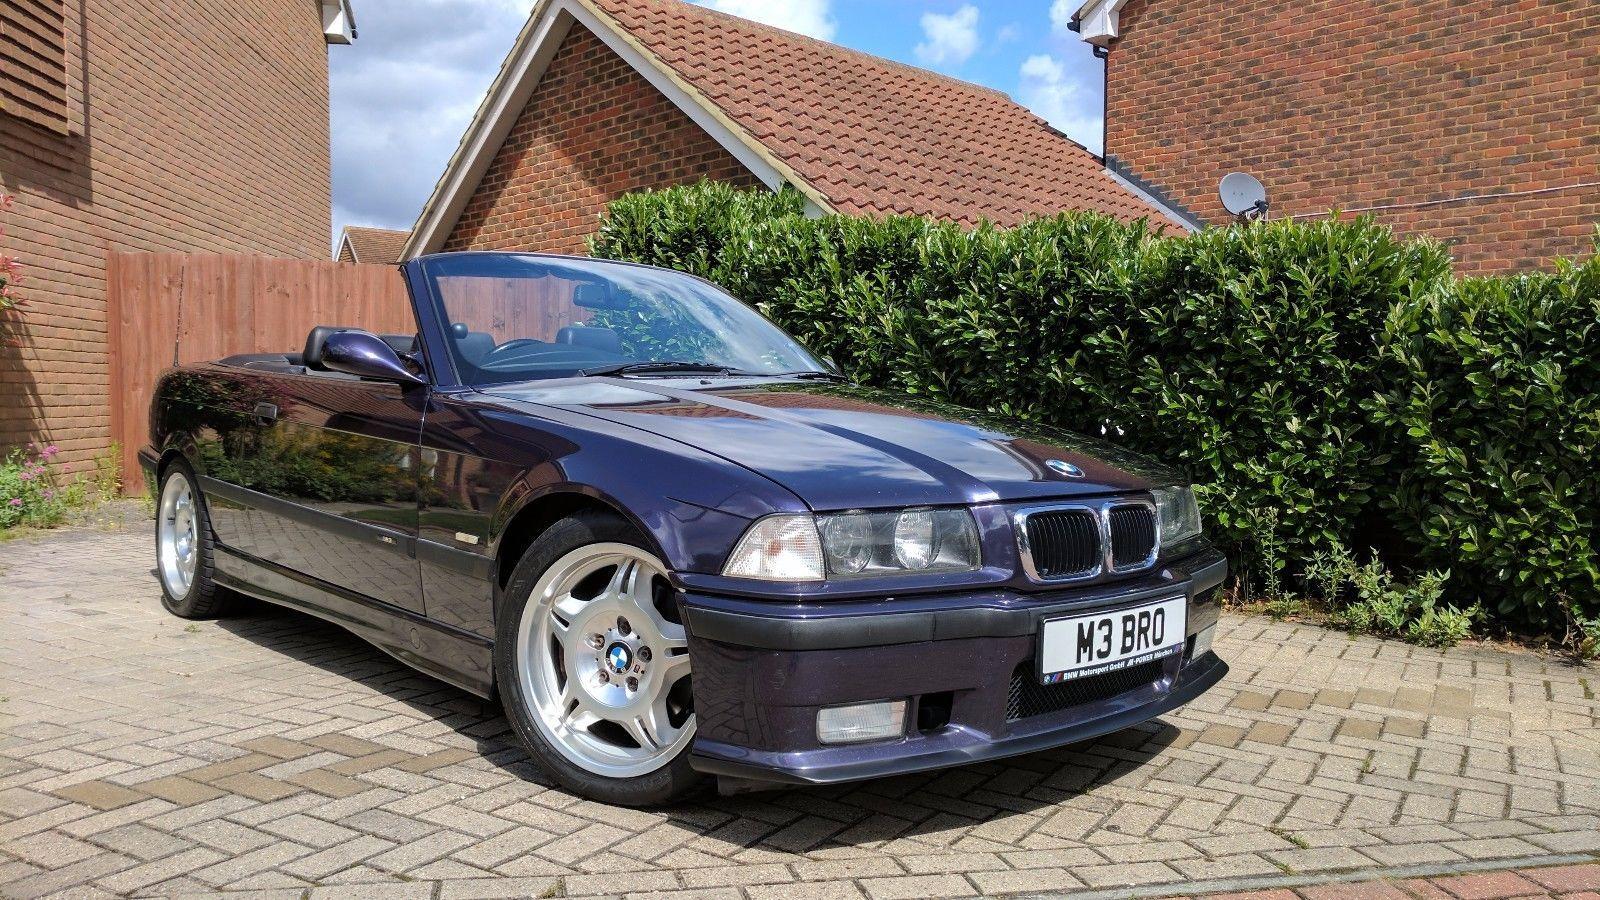 hight resolution of bmw m3 e36 evo cabriolet convertible techno violet fsh vgc hardtop 1998 cabrio